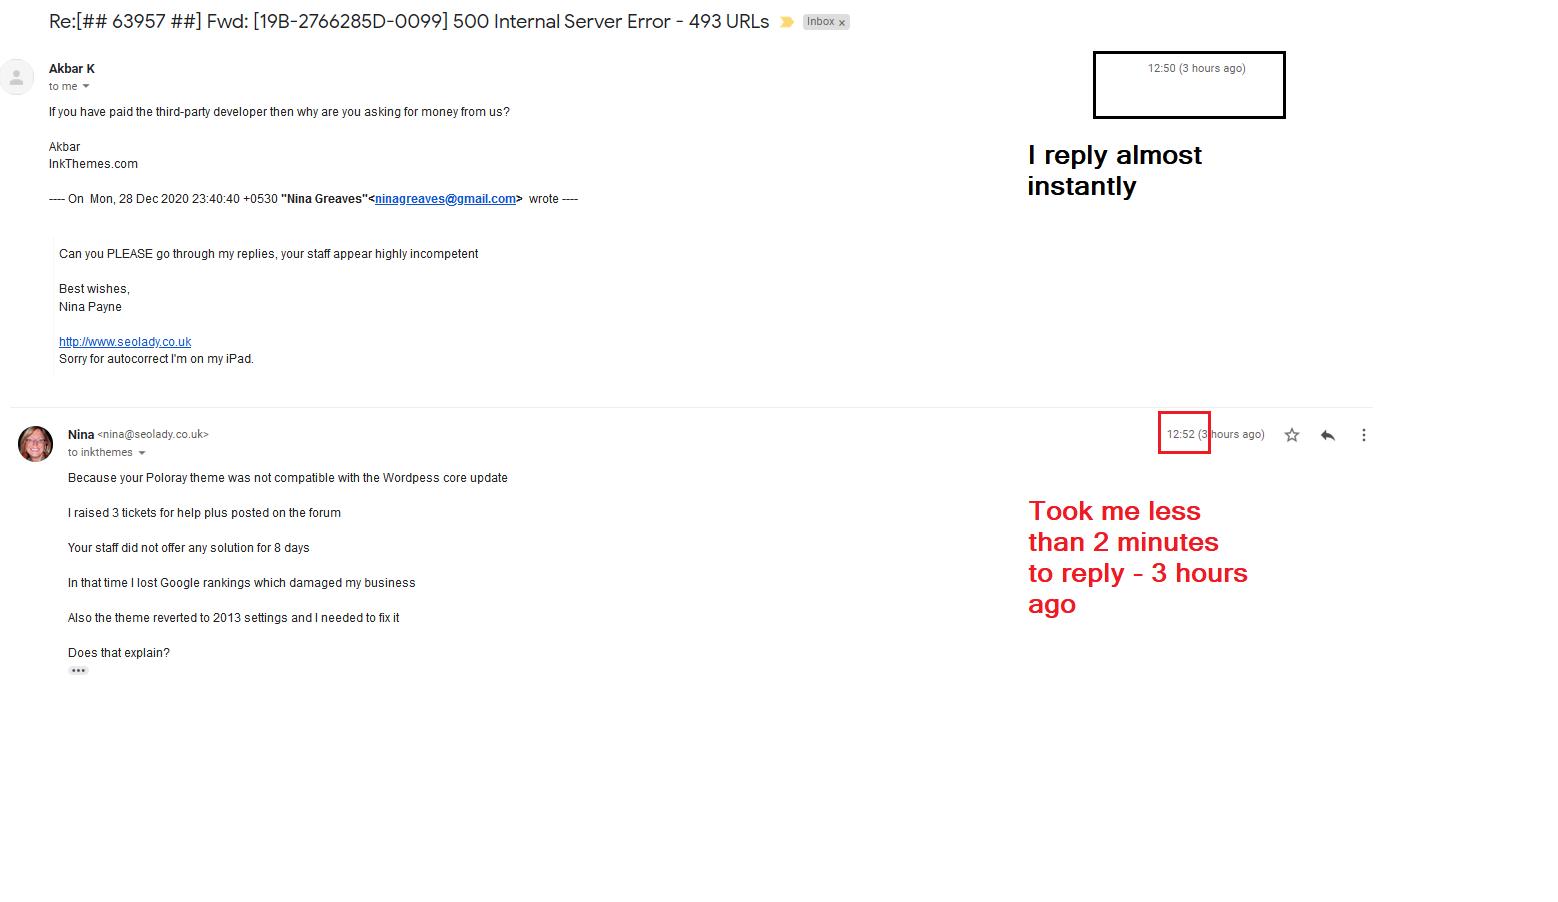 ress Theme InkThemes Review Bad Poor Customer Service Customizer Broken Not Working Core Update 2020